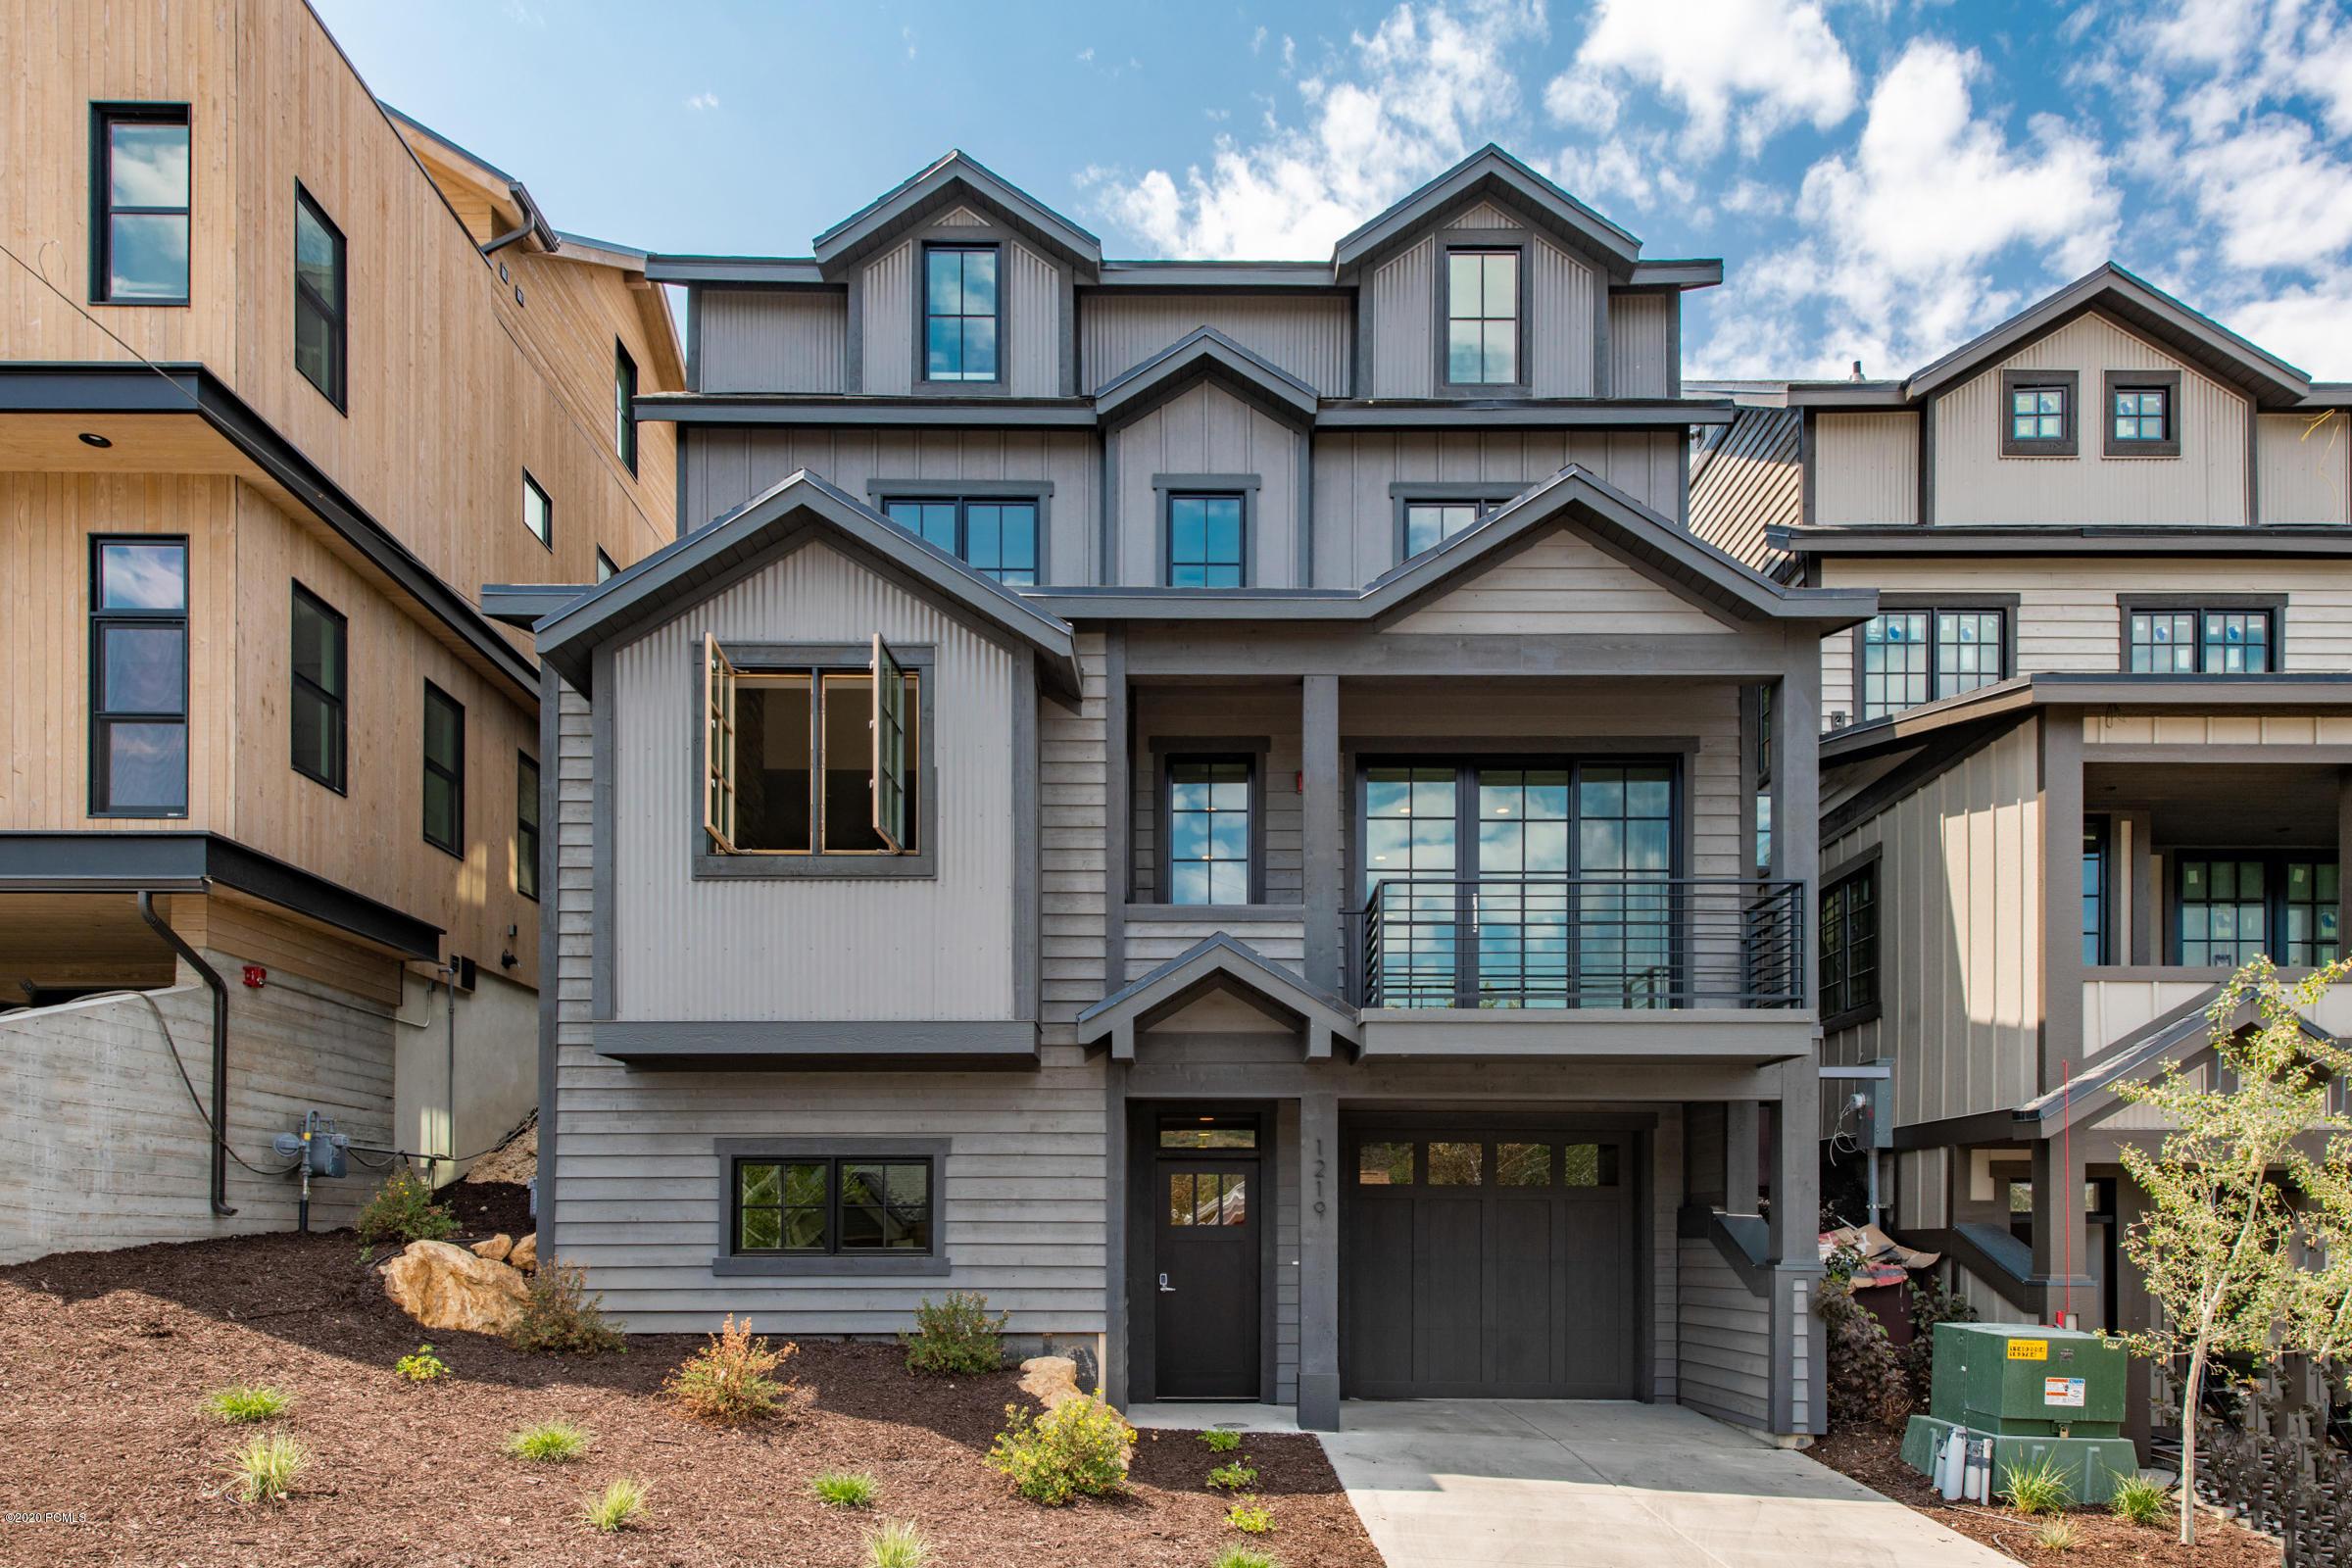 1219 Lowell Avenue, Park City, Utah 84060, 4 Bedrooms Bedrooms, ,4 BathroomsBathrooms,Single Family,For Sale,Lowell,12002868